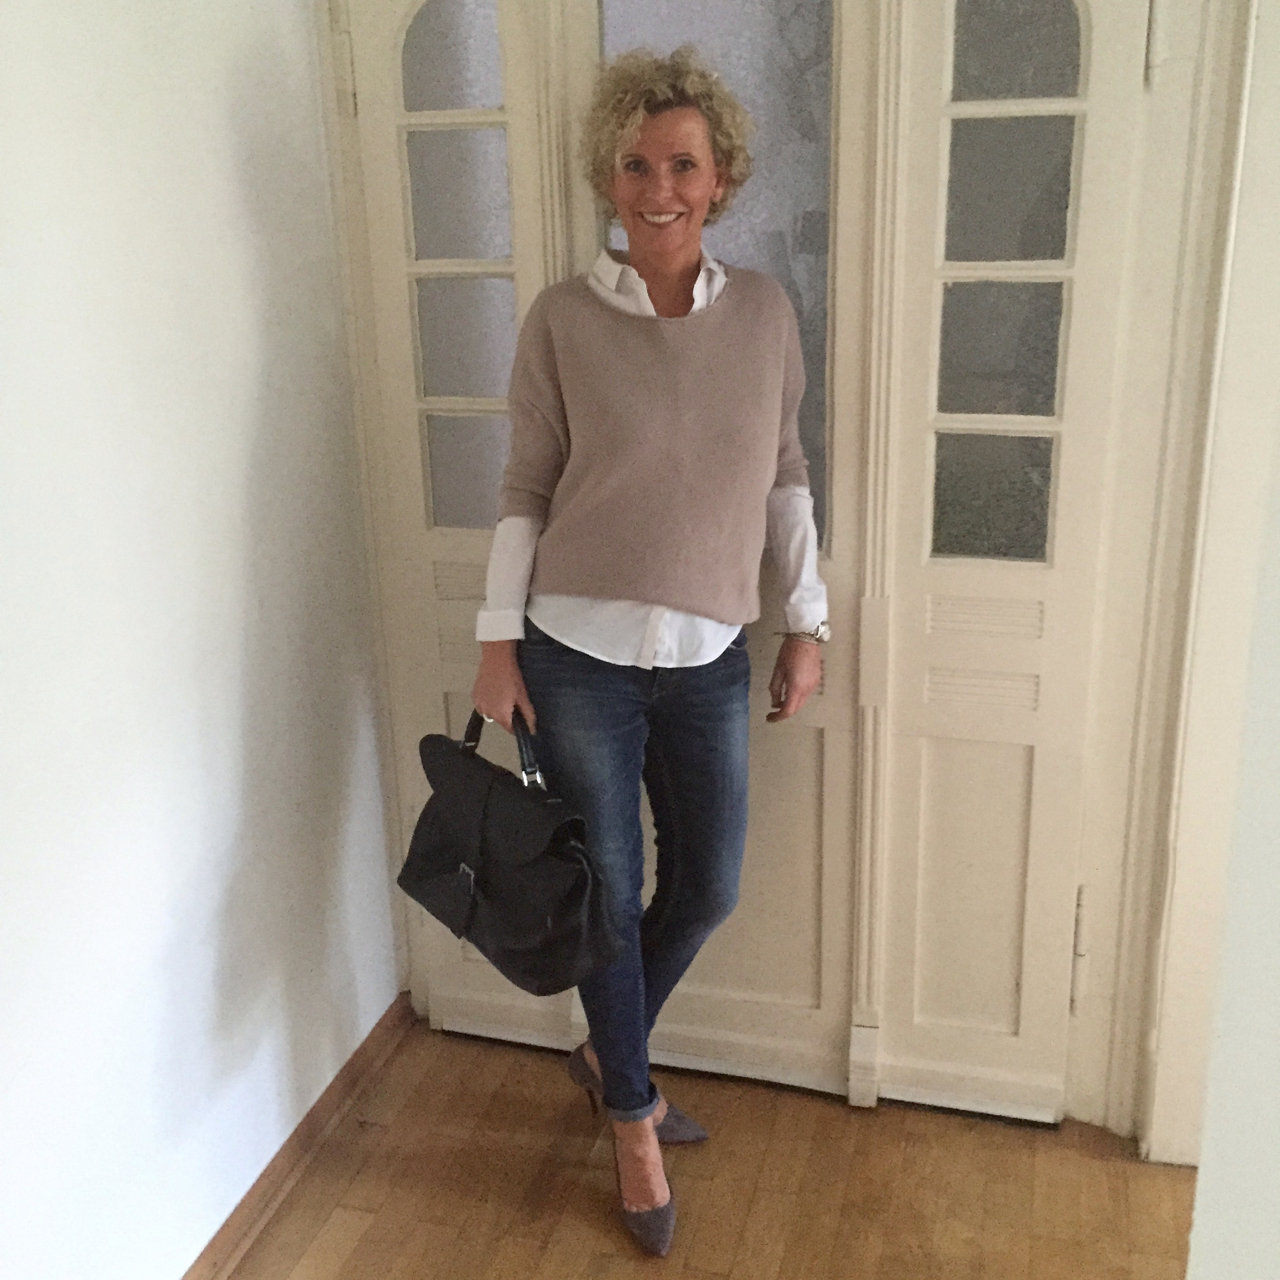 33987ca6e0fe47 oben links: weiße Bluse – Cos, Jeans – Please, Gürtel – Closed, Schuhe –  Patrizia Pepe, Tasche – Vic